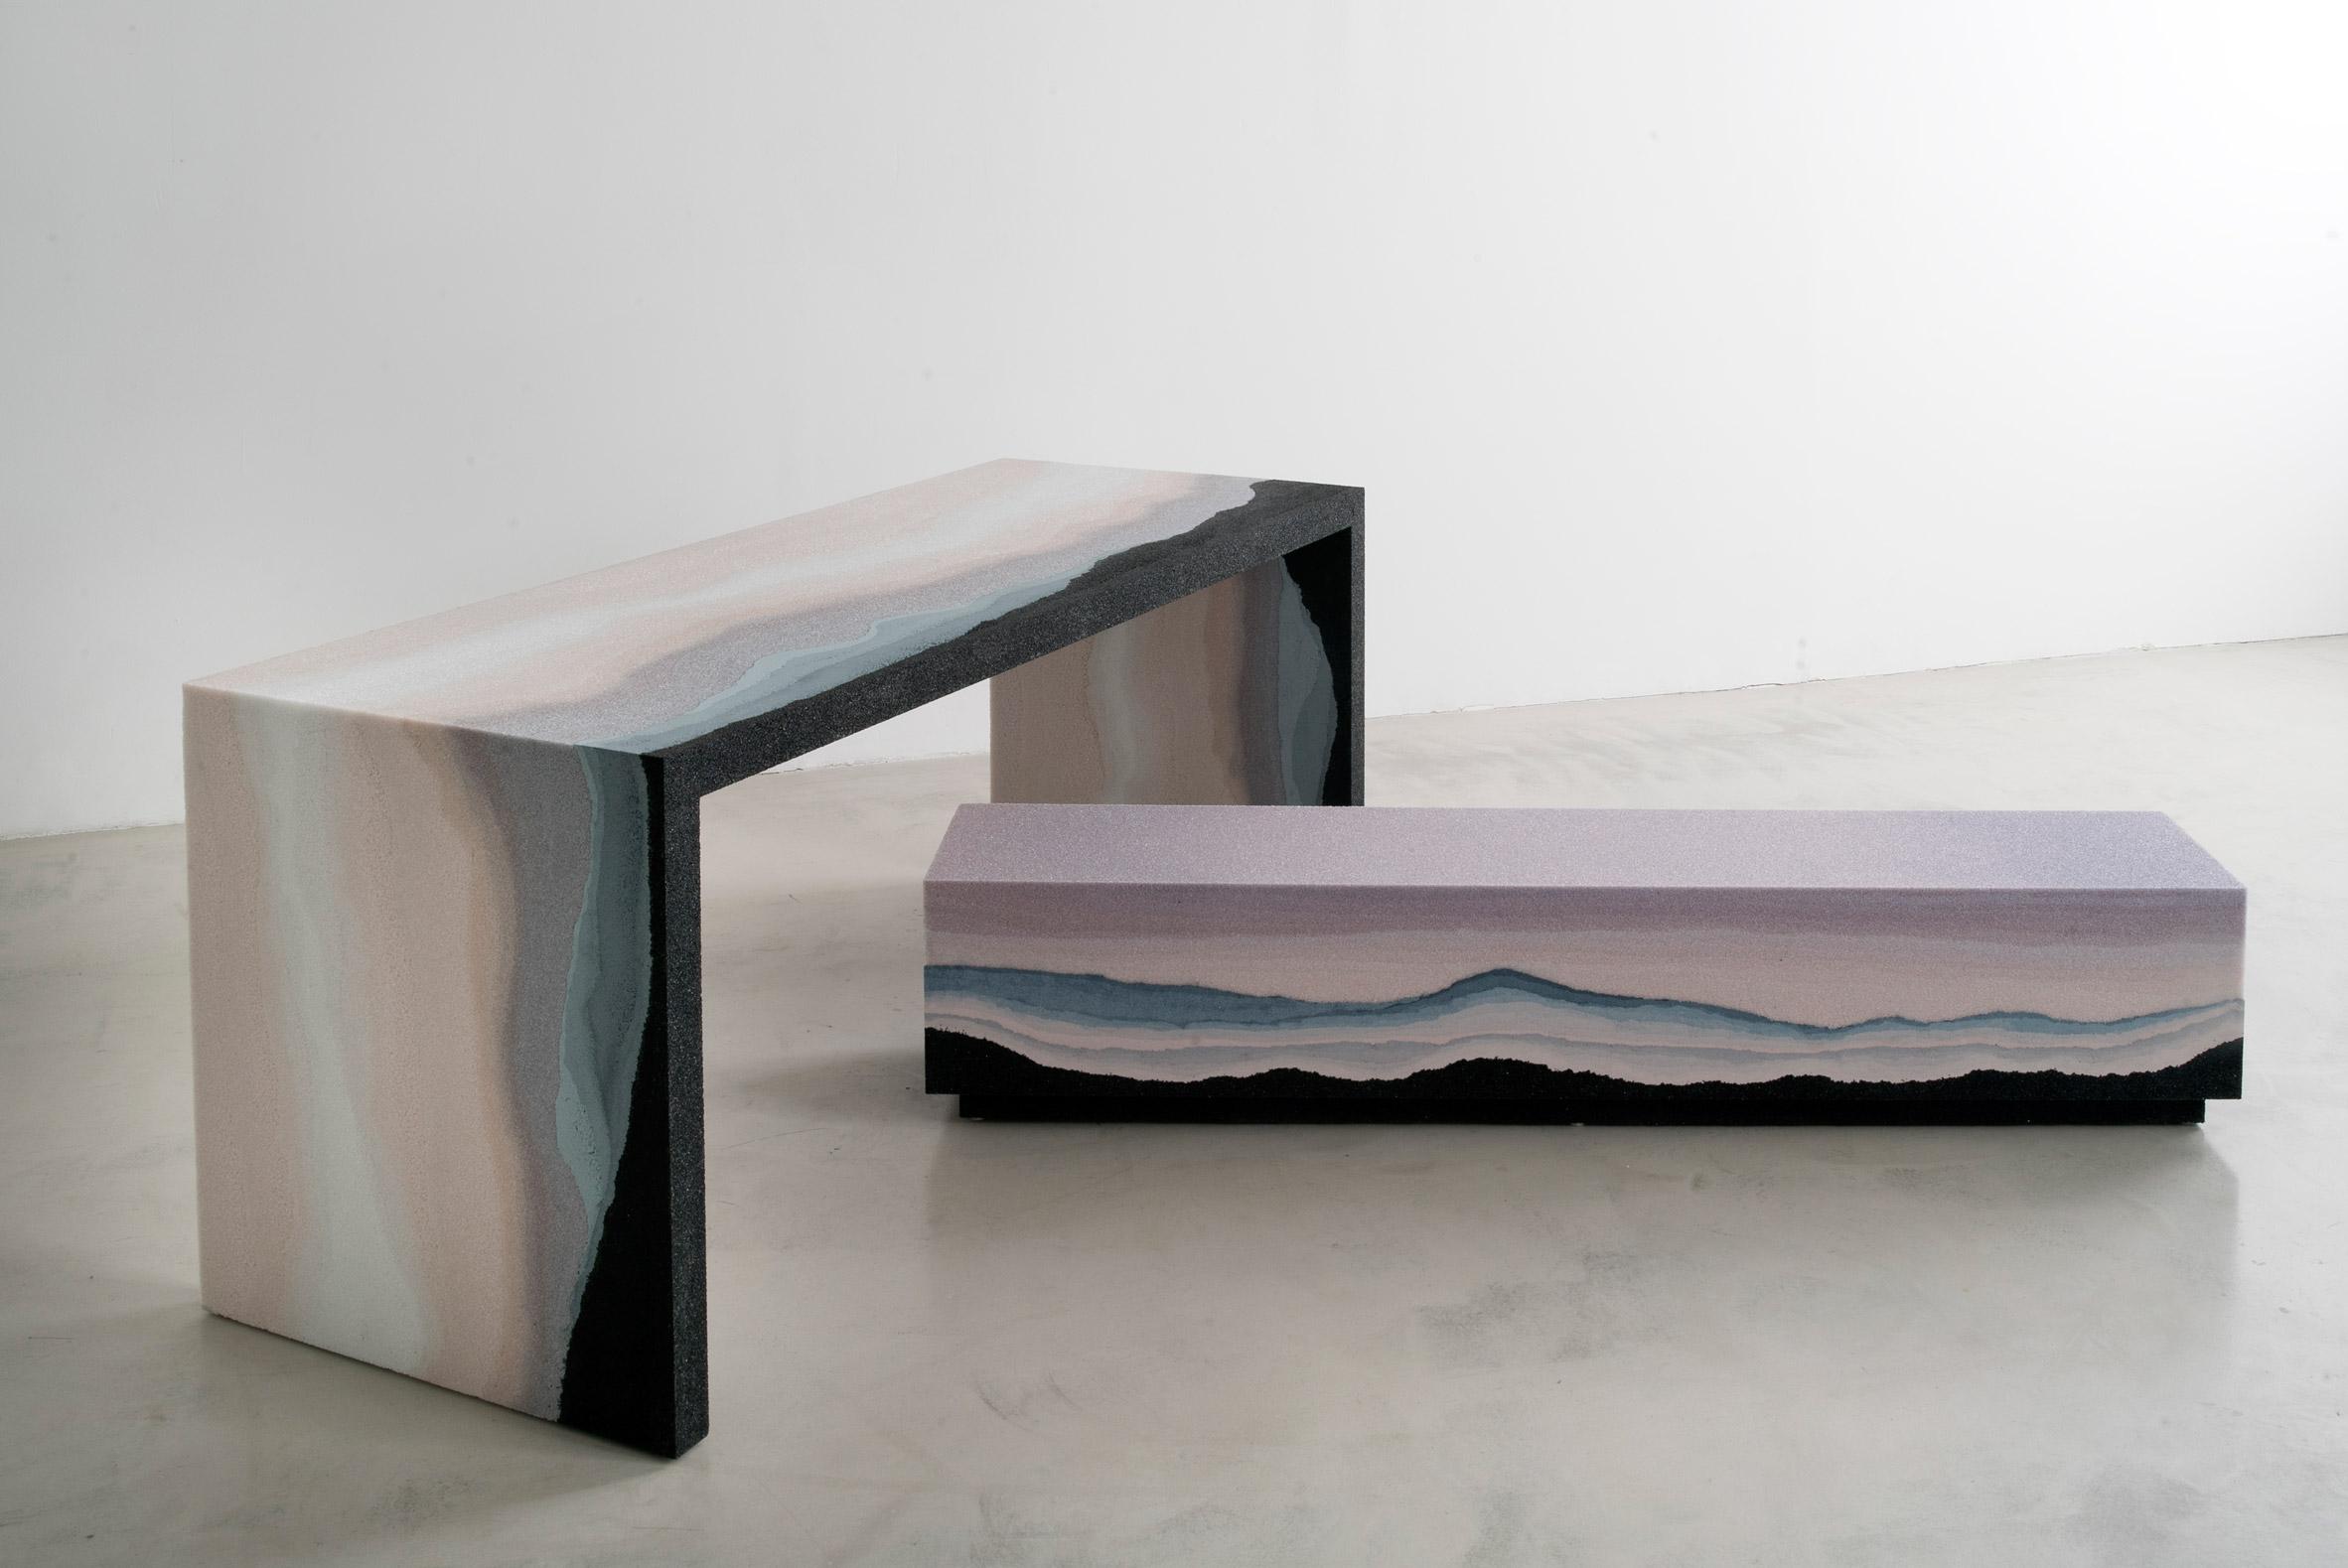 jacob-gossett-escape-series-fernando-mastrangelo-furniture-gradient_dezeen_9